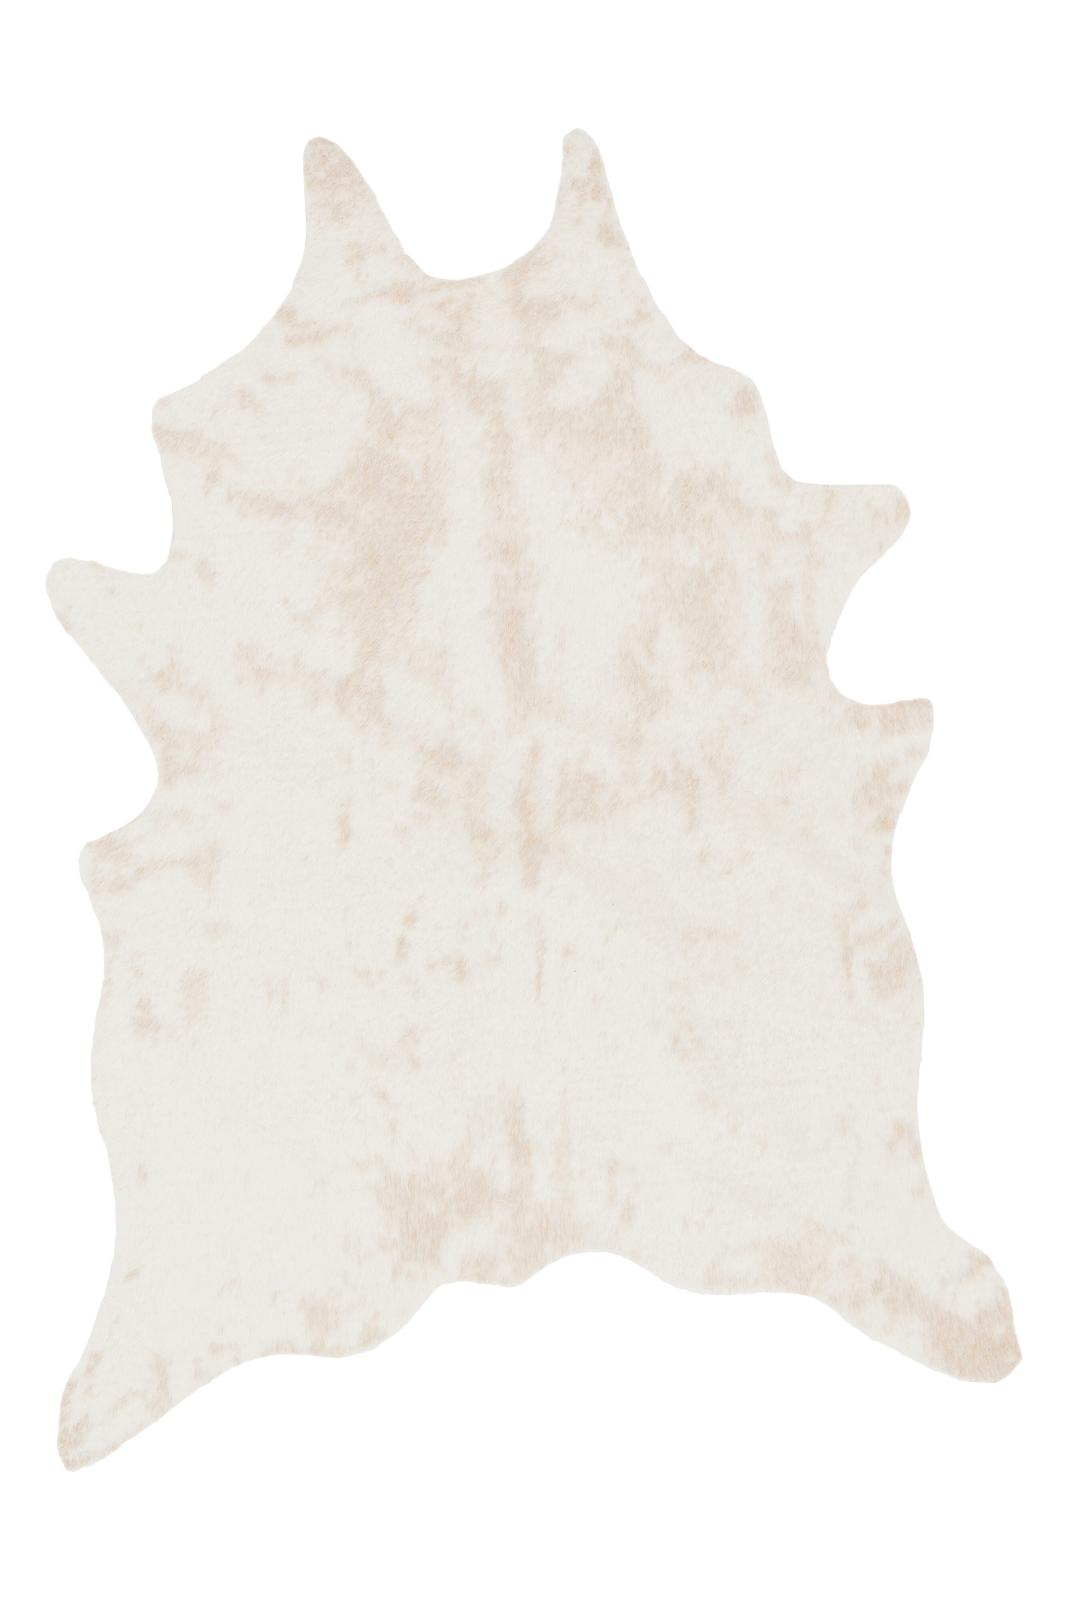 White Cowhide